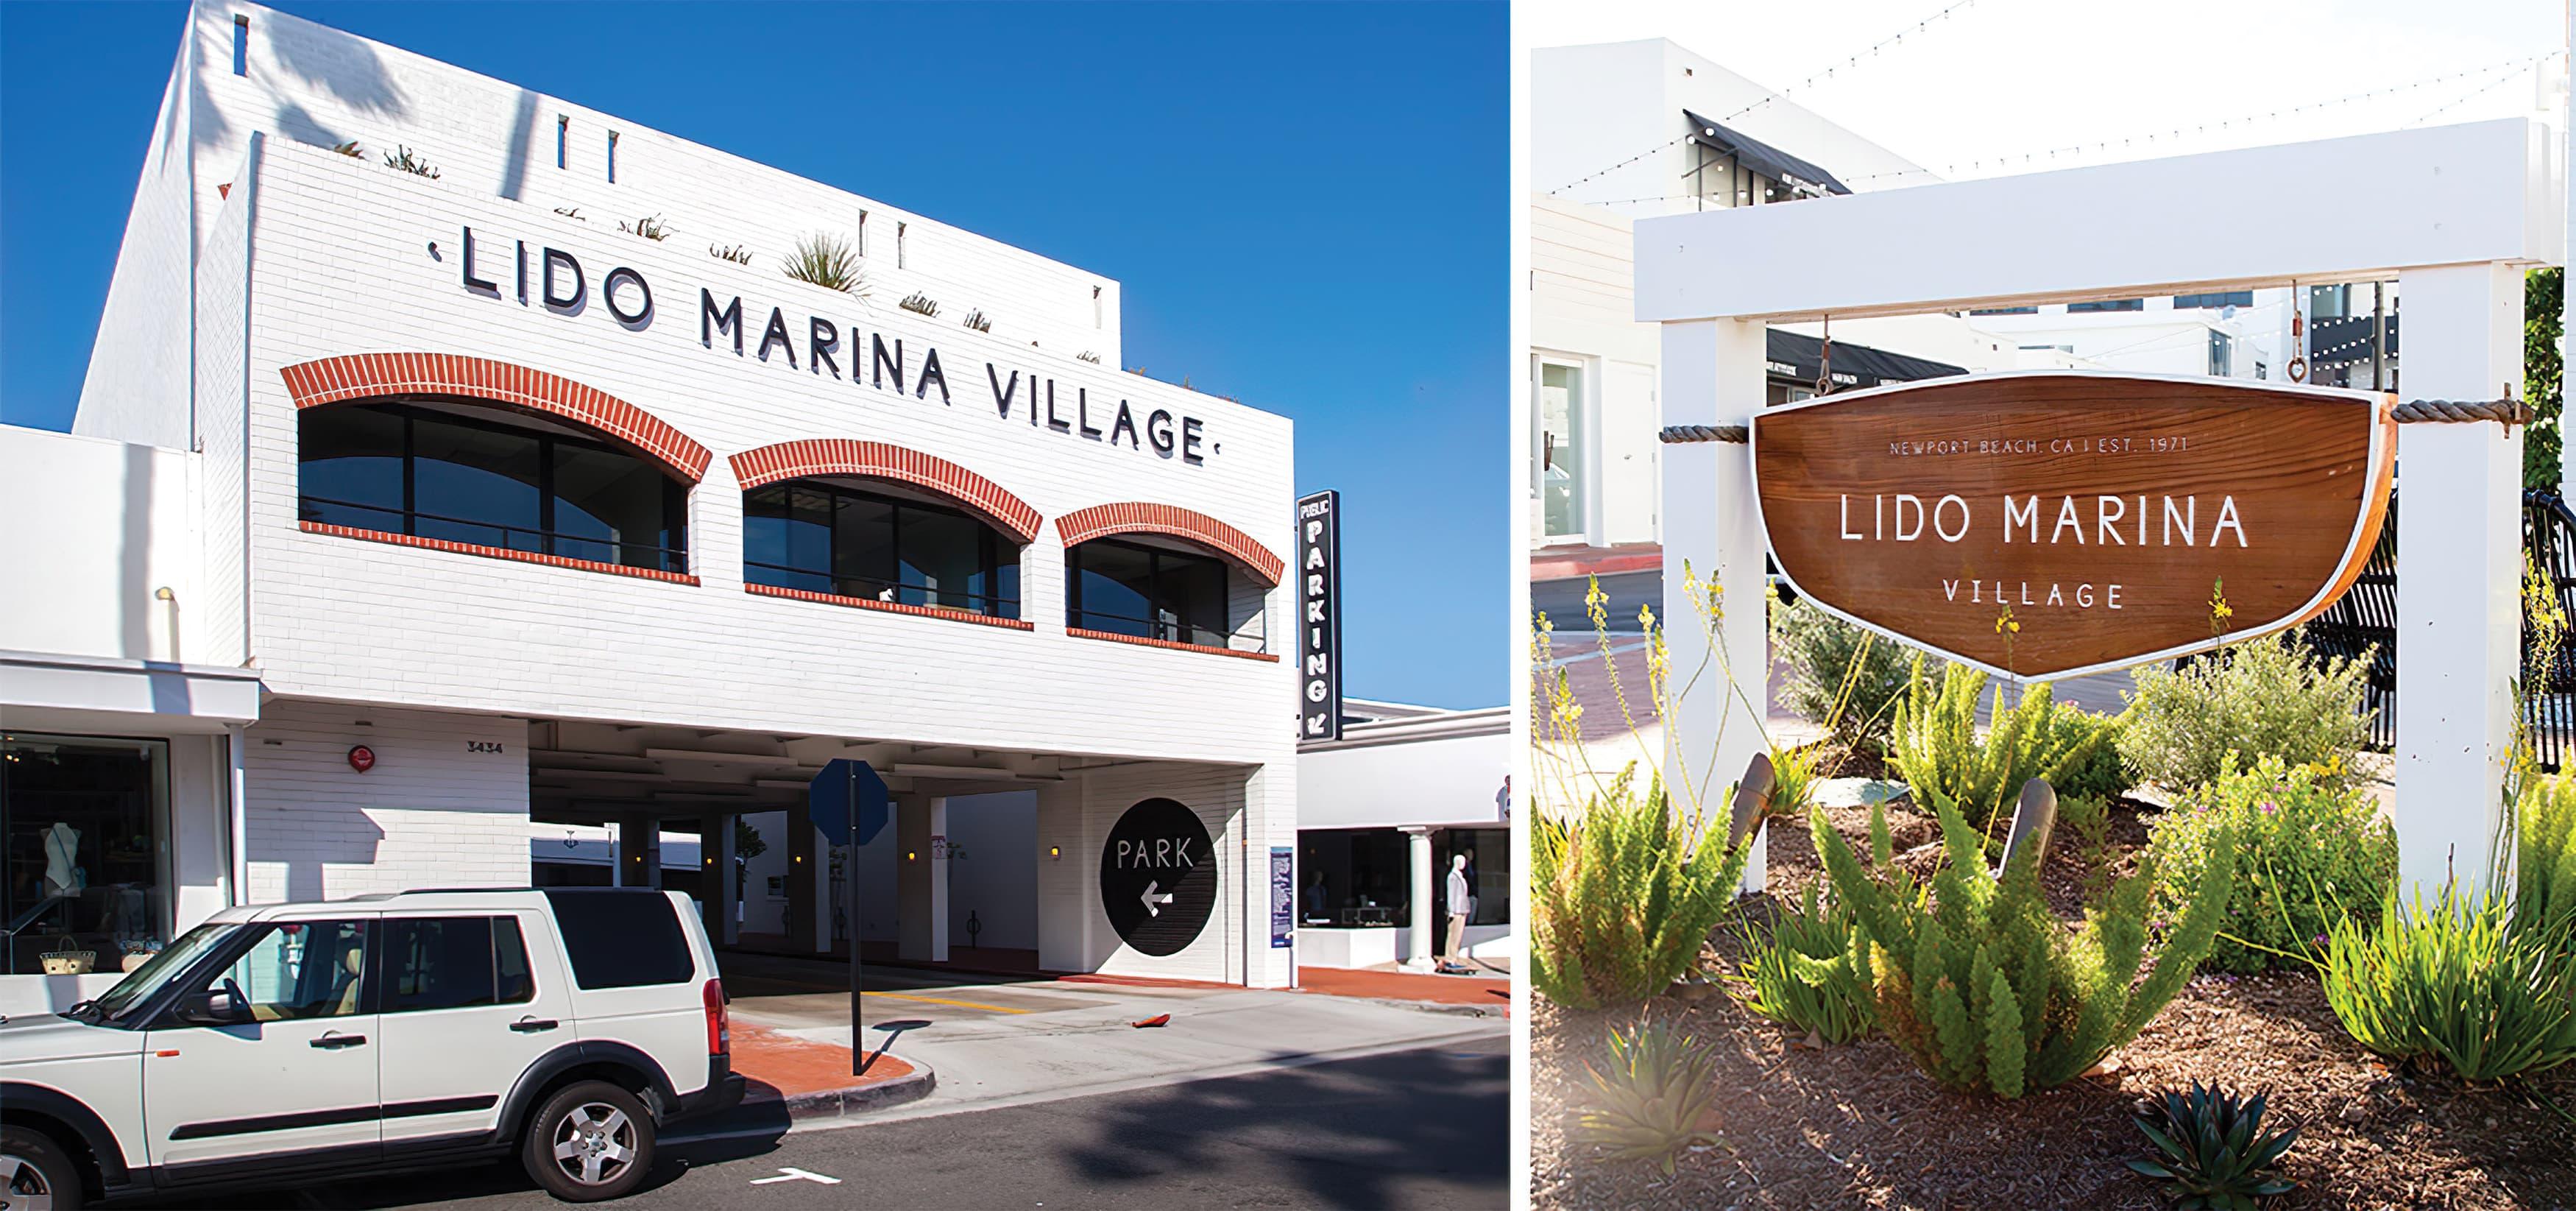 Lido Marina Village Newport Beach Graphic Architecture and Identity Signage